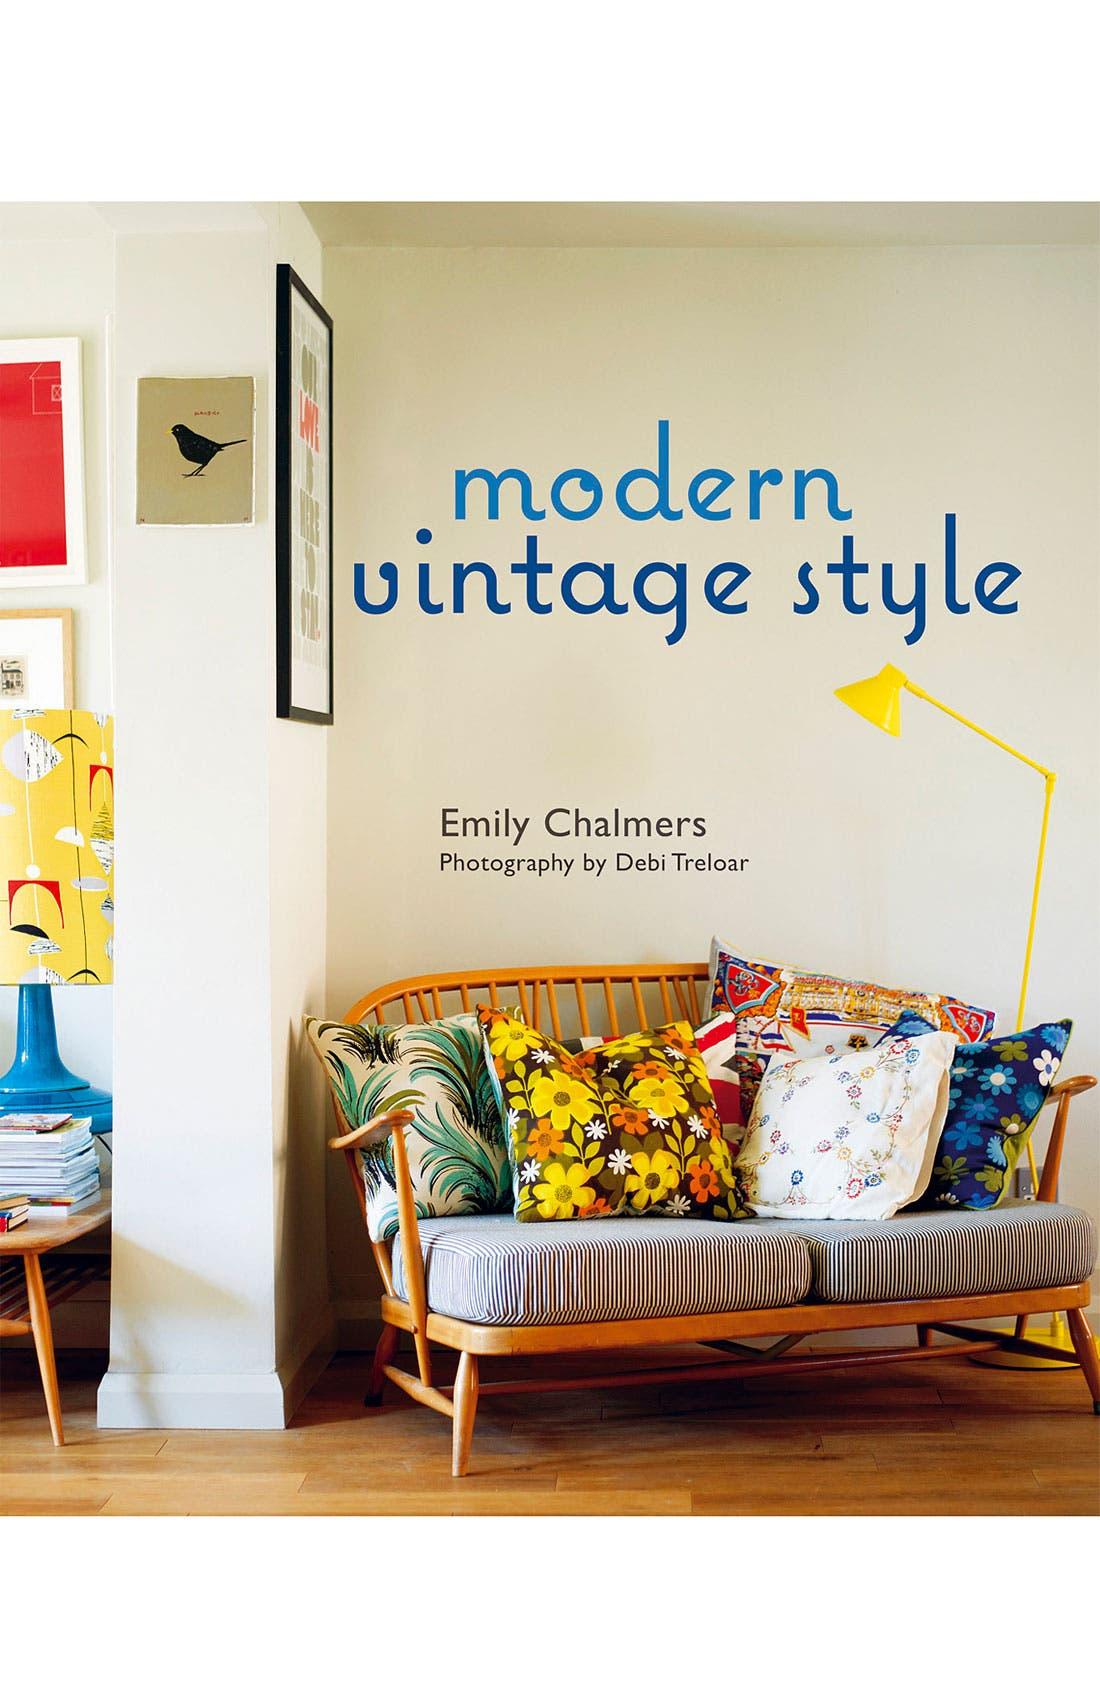 Main Image - 'Modern Vintage Style' Interior Design Book